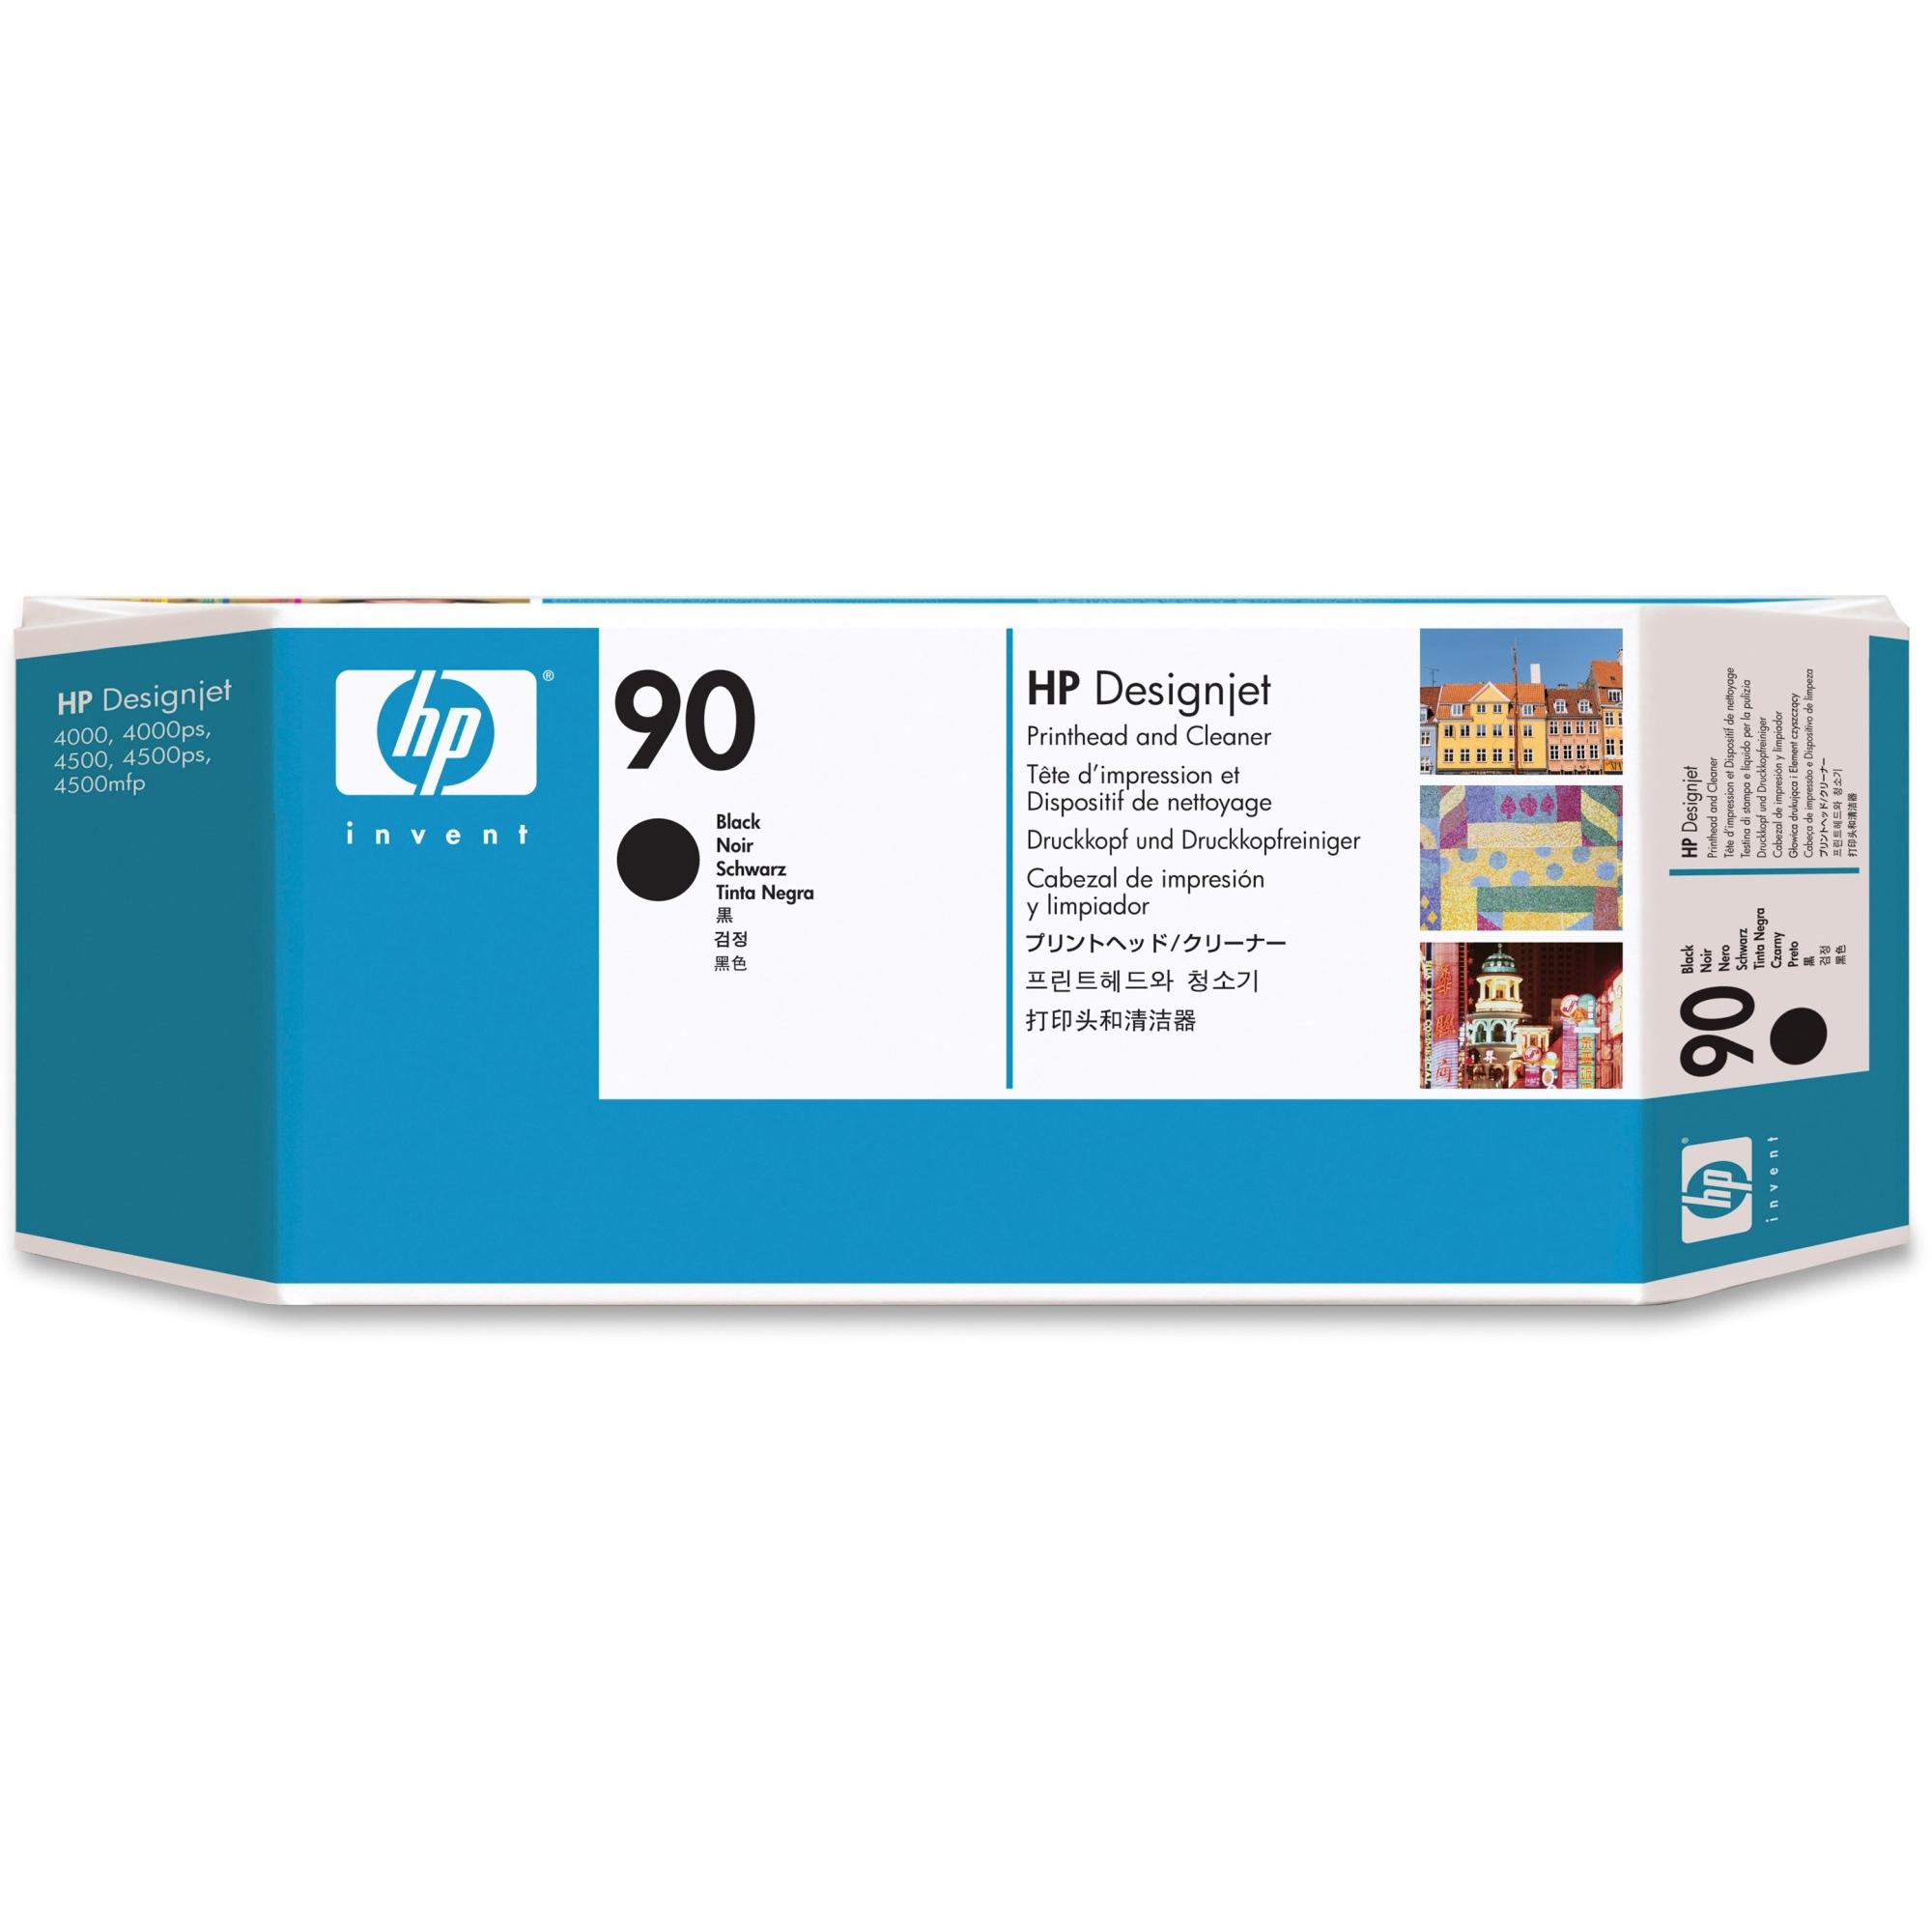 10 UNITS NO 90 BLACK PRINTHEAD & CLEANER FOR DESIGNJET 4000/4500